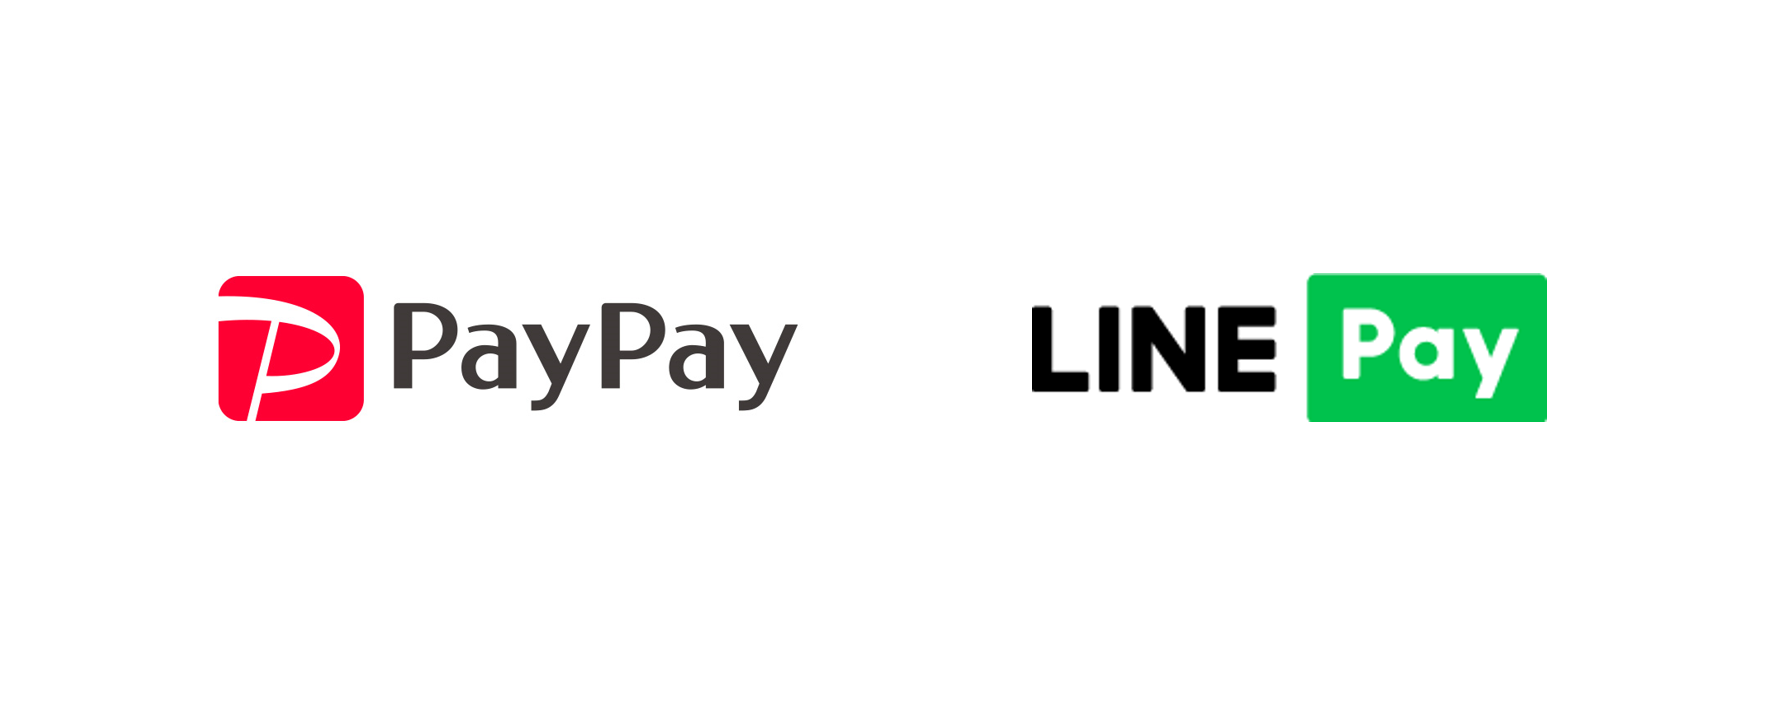 LINE Pay、新規オフライン加盟店募集停止と手数料引き下げ〜PayPay加盟店での利用開始を受け〜